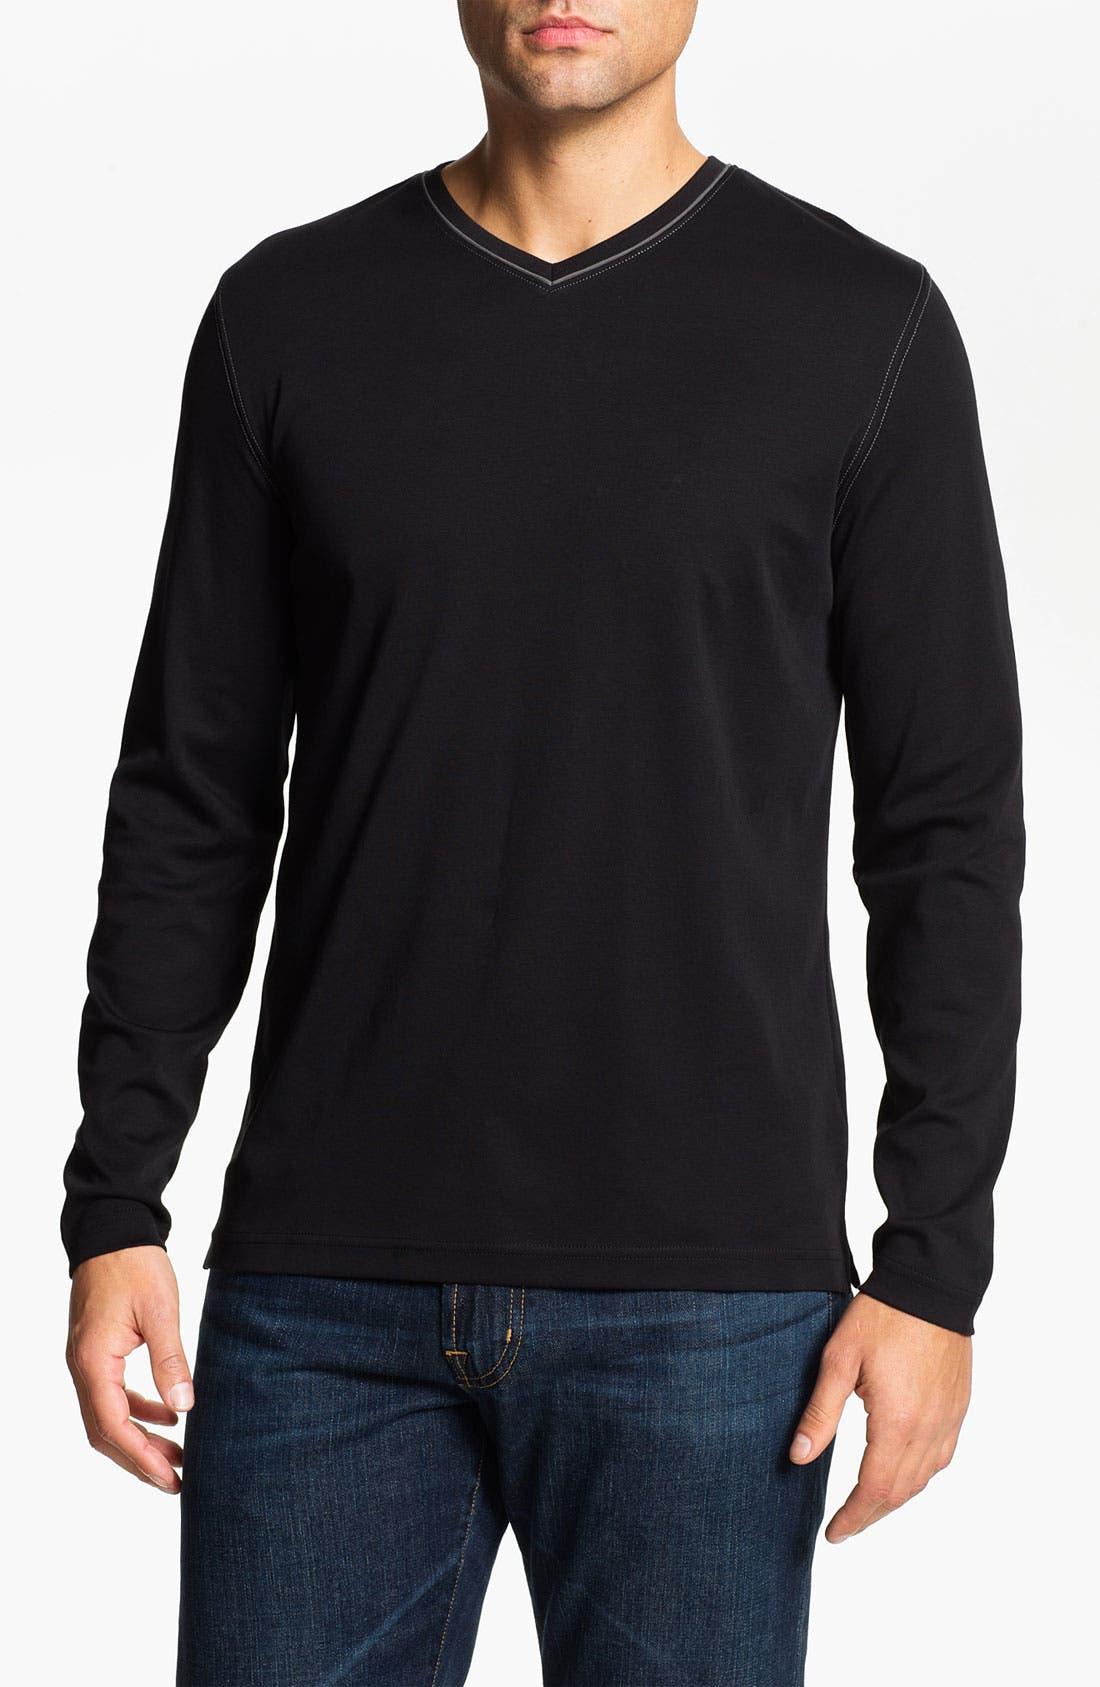 Main Image - Robert Barakett 'Georgia' V-Neck T-Shirt